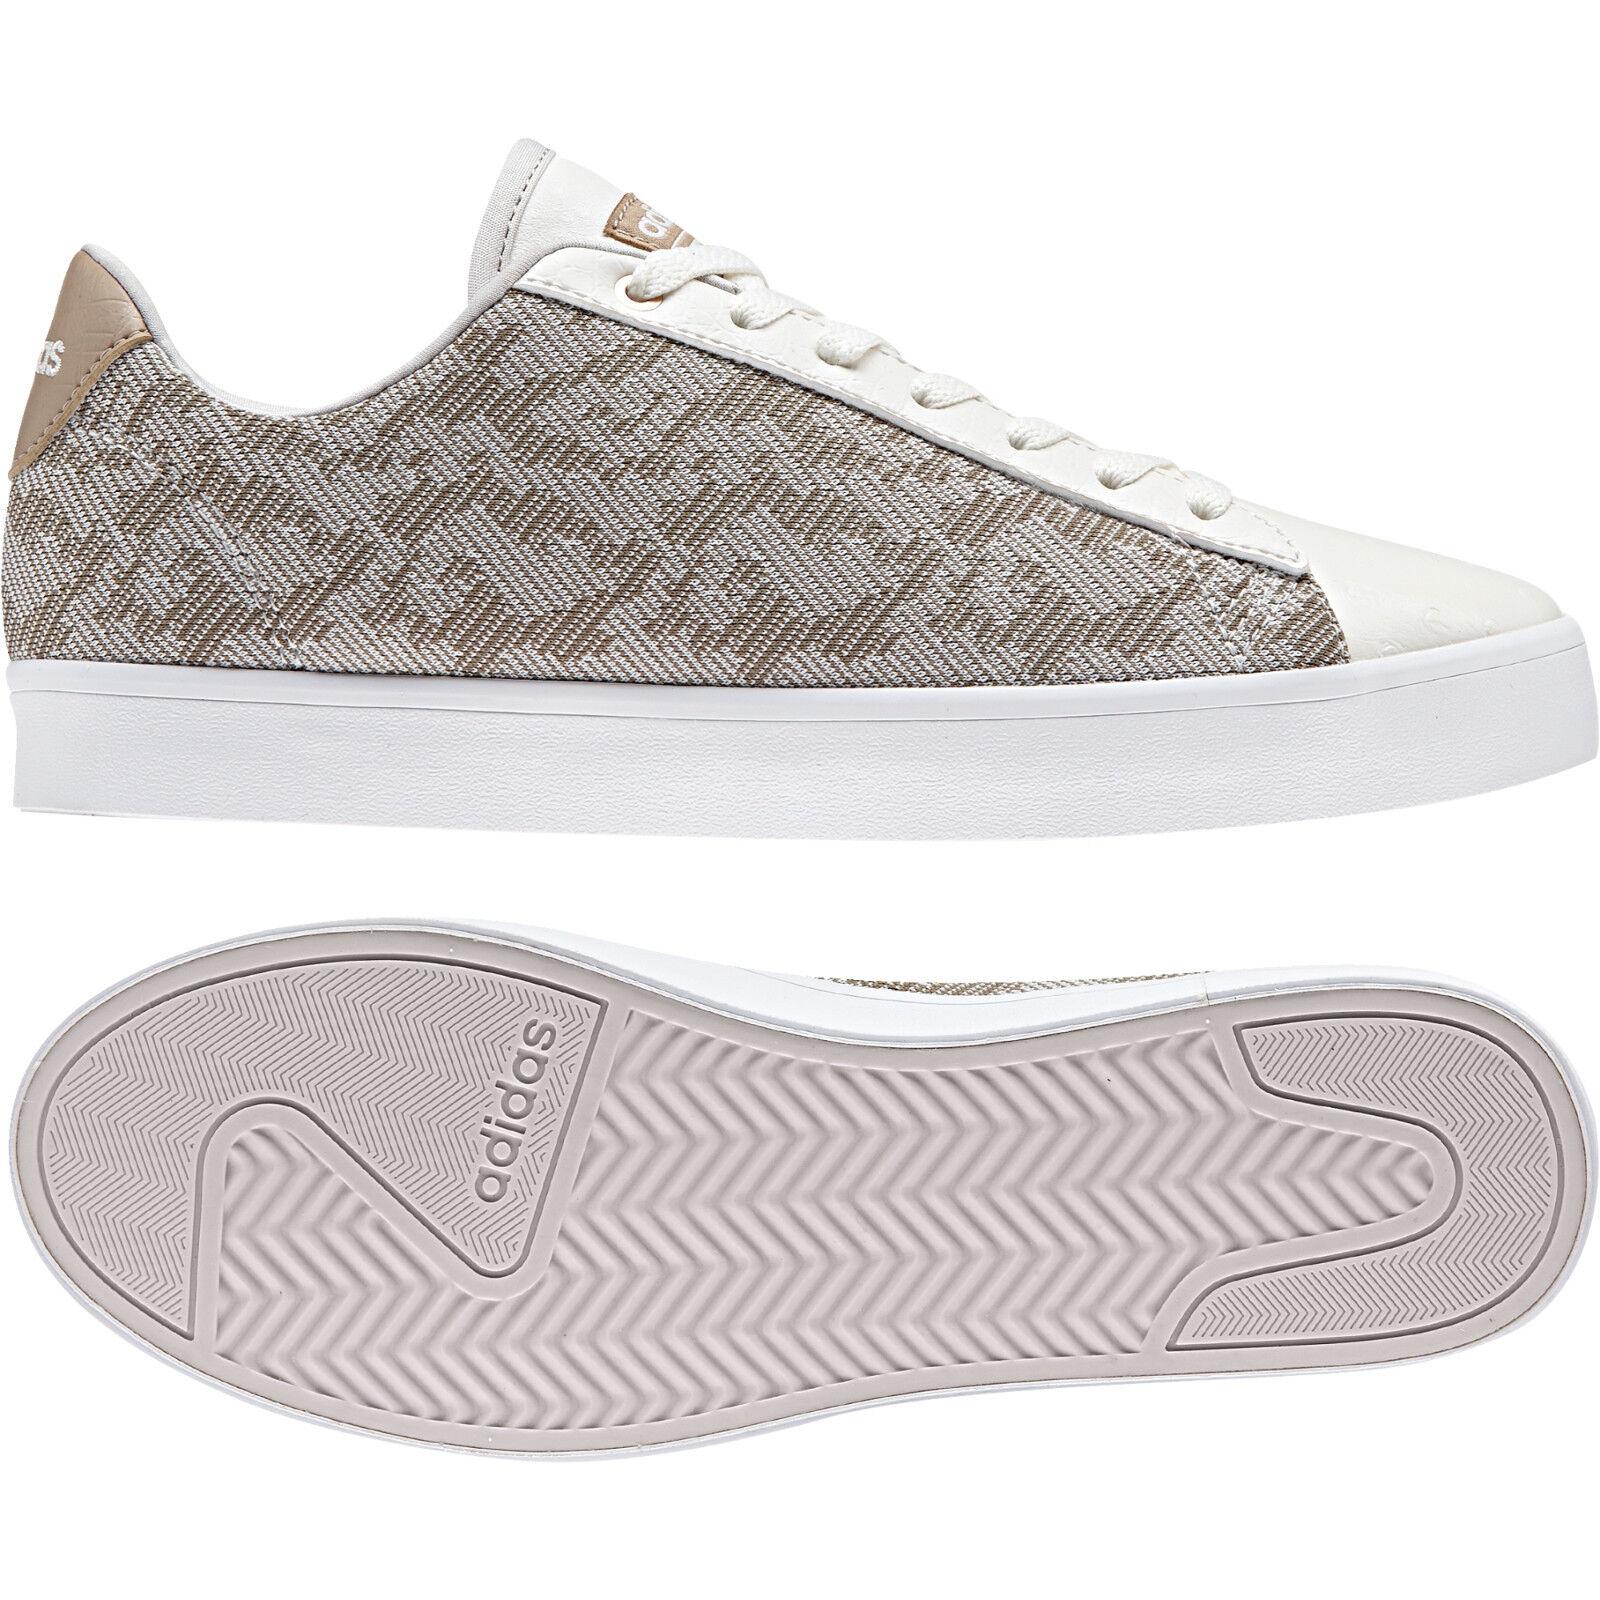 Adidas Neo Women shoes Cloudfoam Daily QT Casual Modern Sneakers CG5755 New 2018